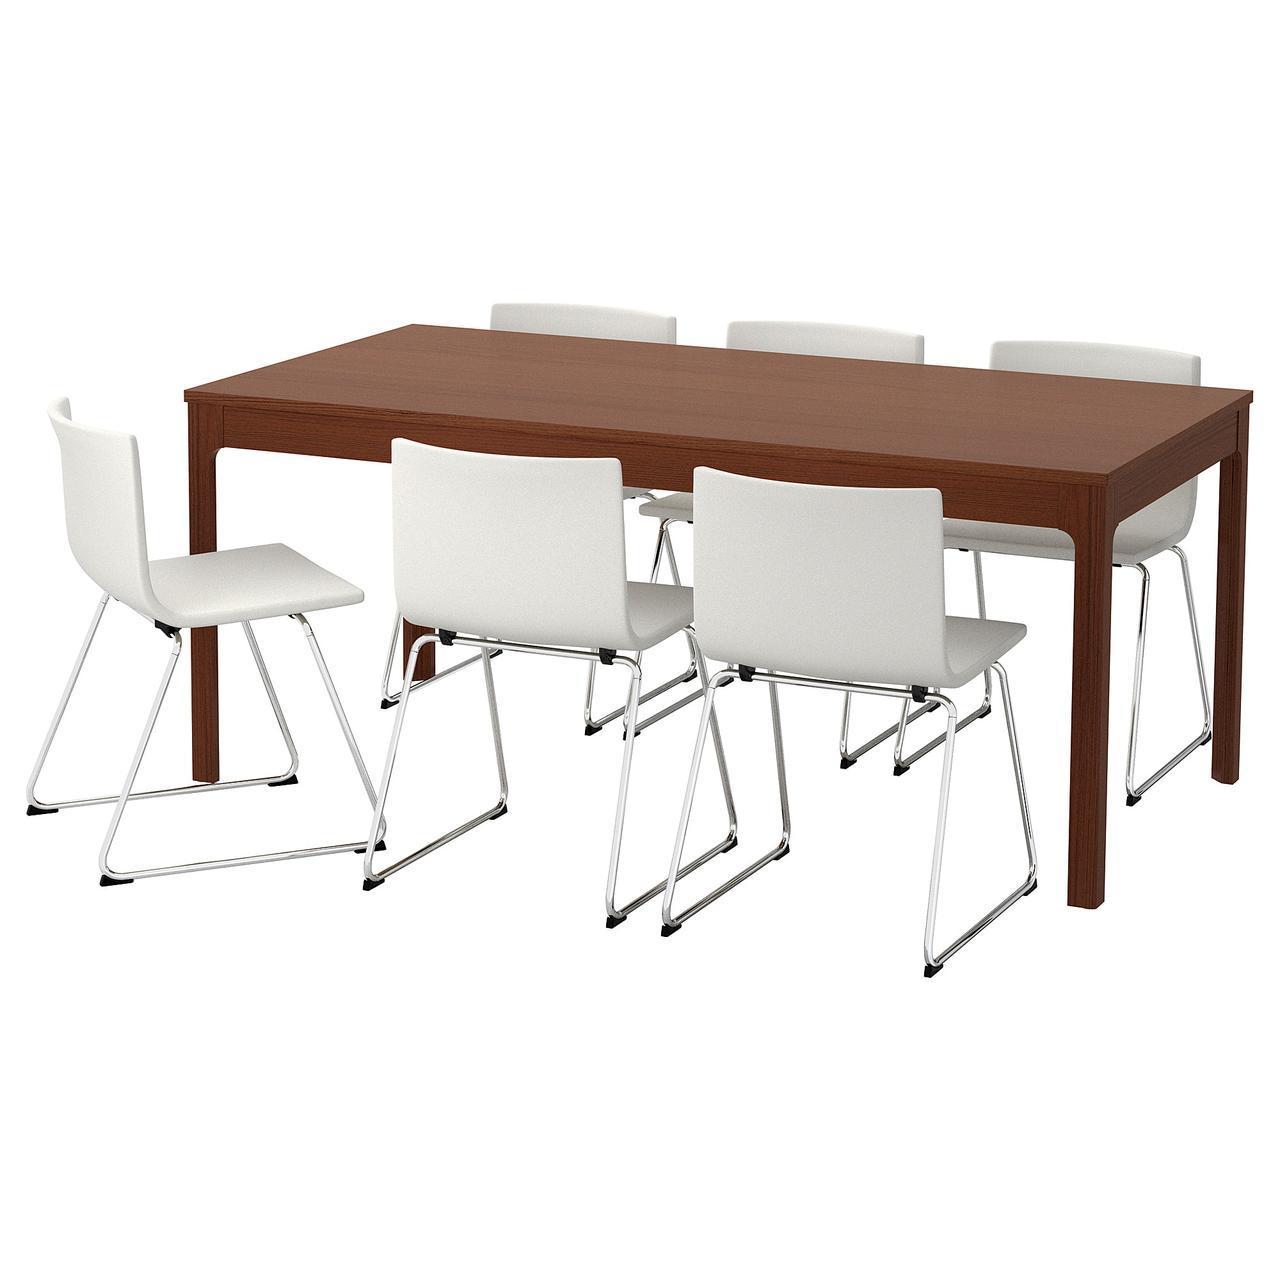 ✅ IKEA EKEDALEN / BERNHARD (692.292.17) Стол и 6 стульев, коричневый, мюк белый